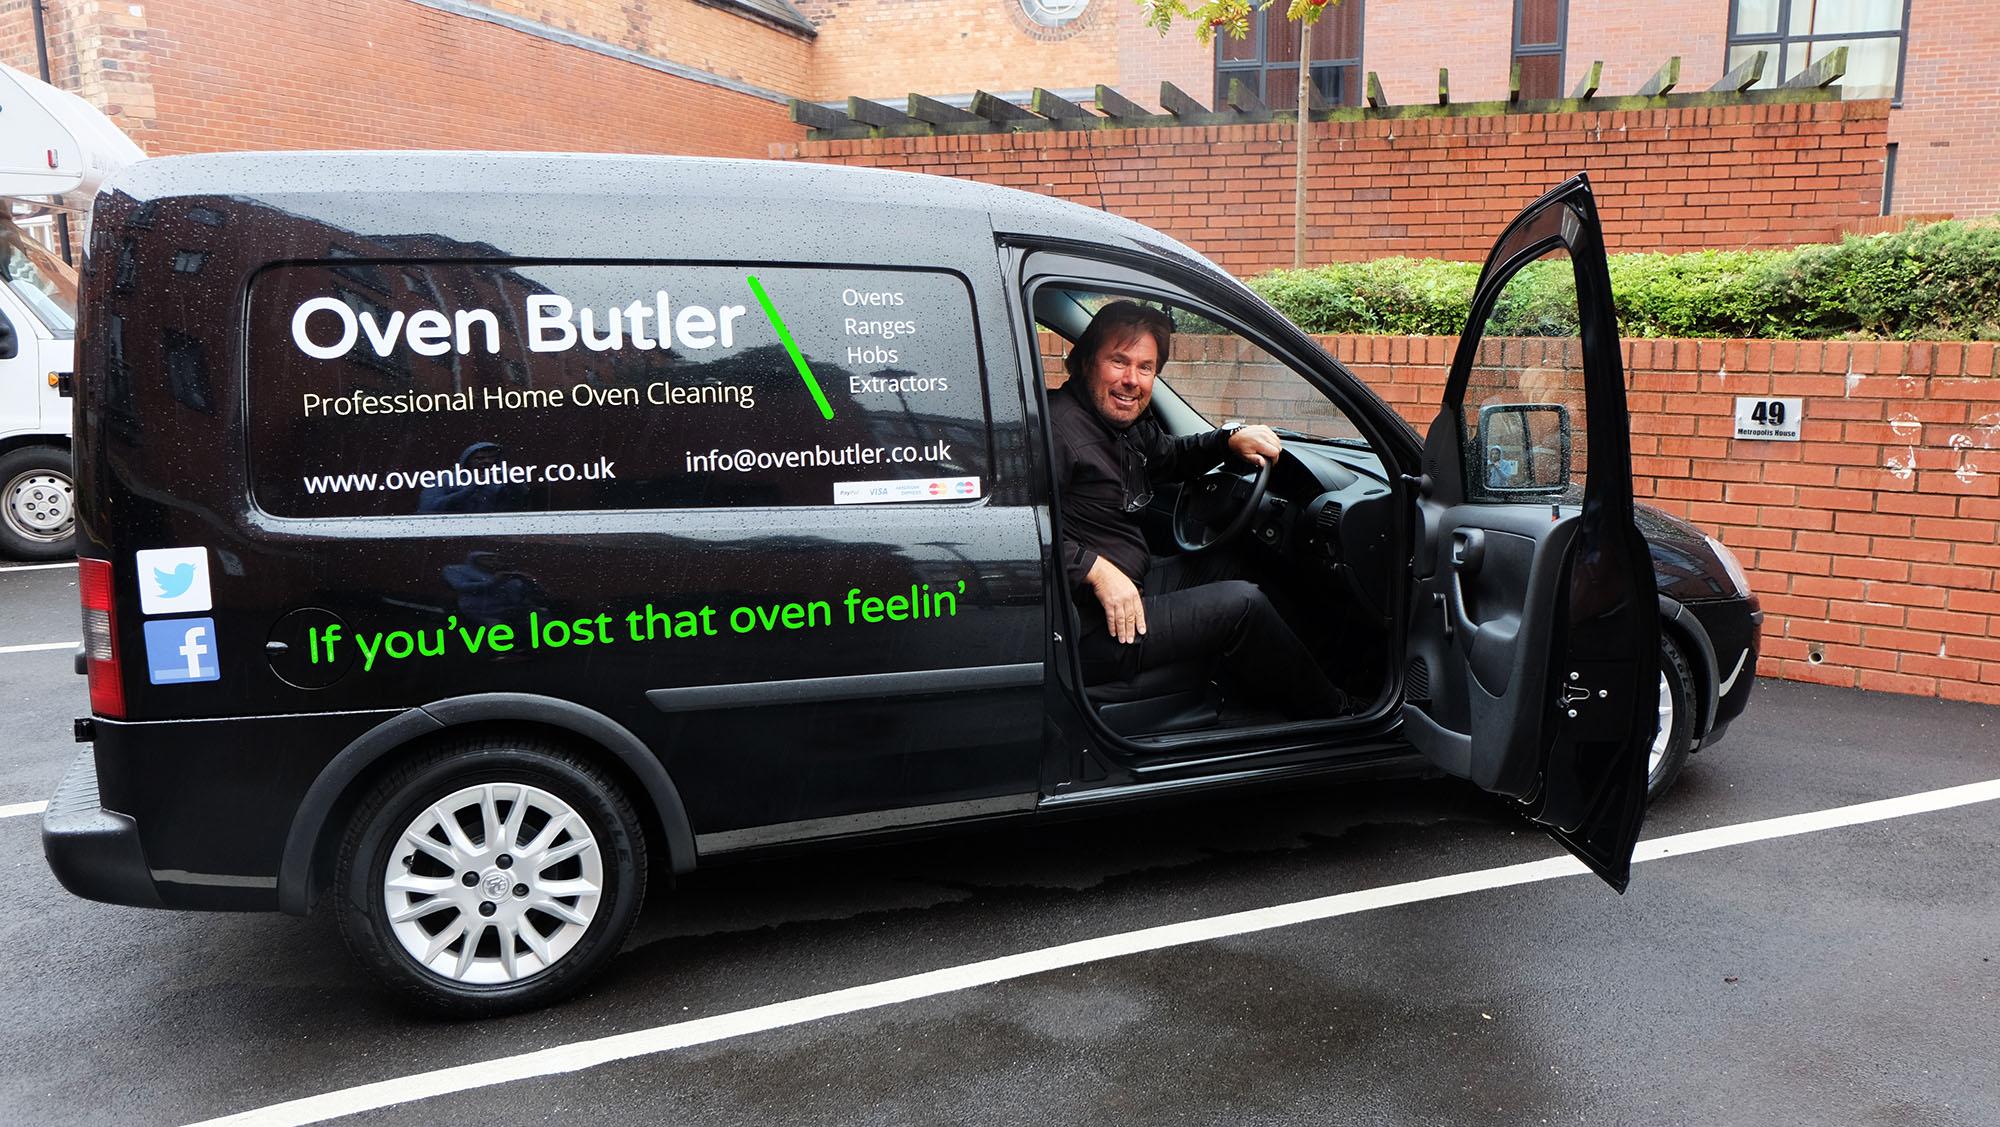 Oven Butler